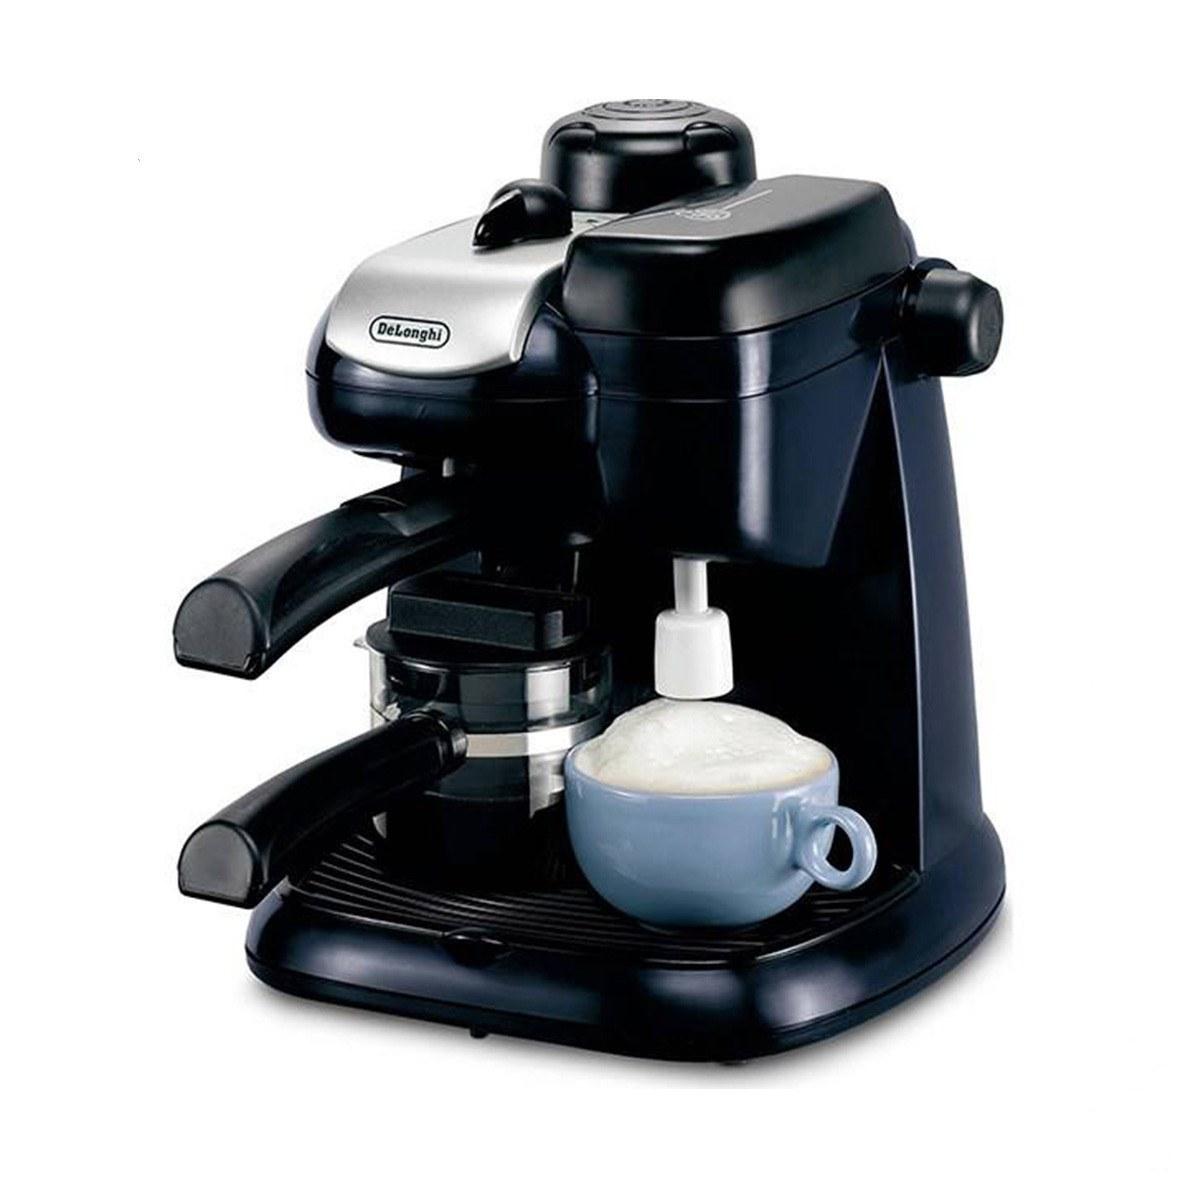 اسپرسوساز دلونگی 800 وات EC9 Delonghi Espresso Maker